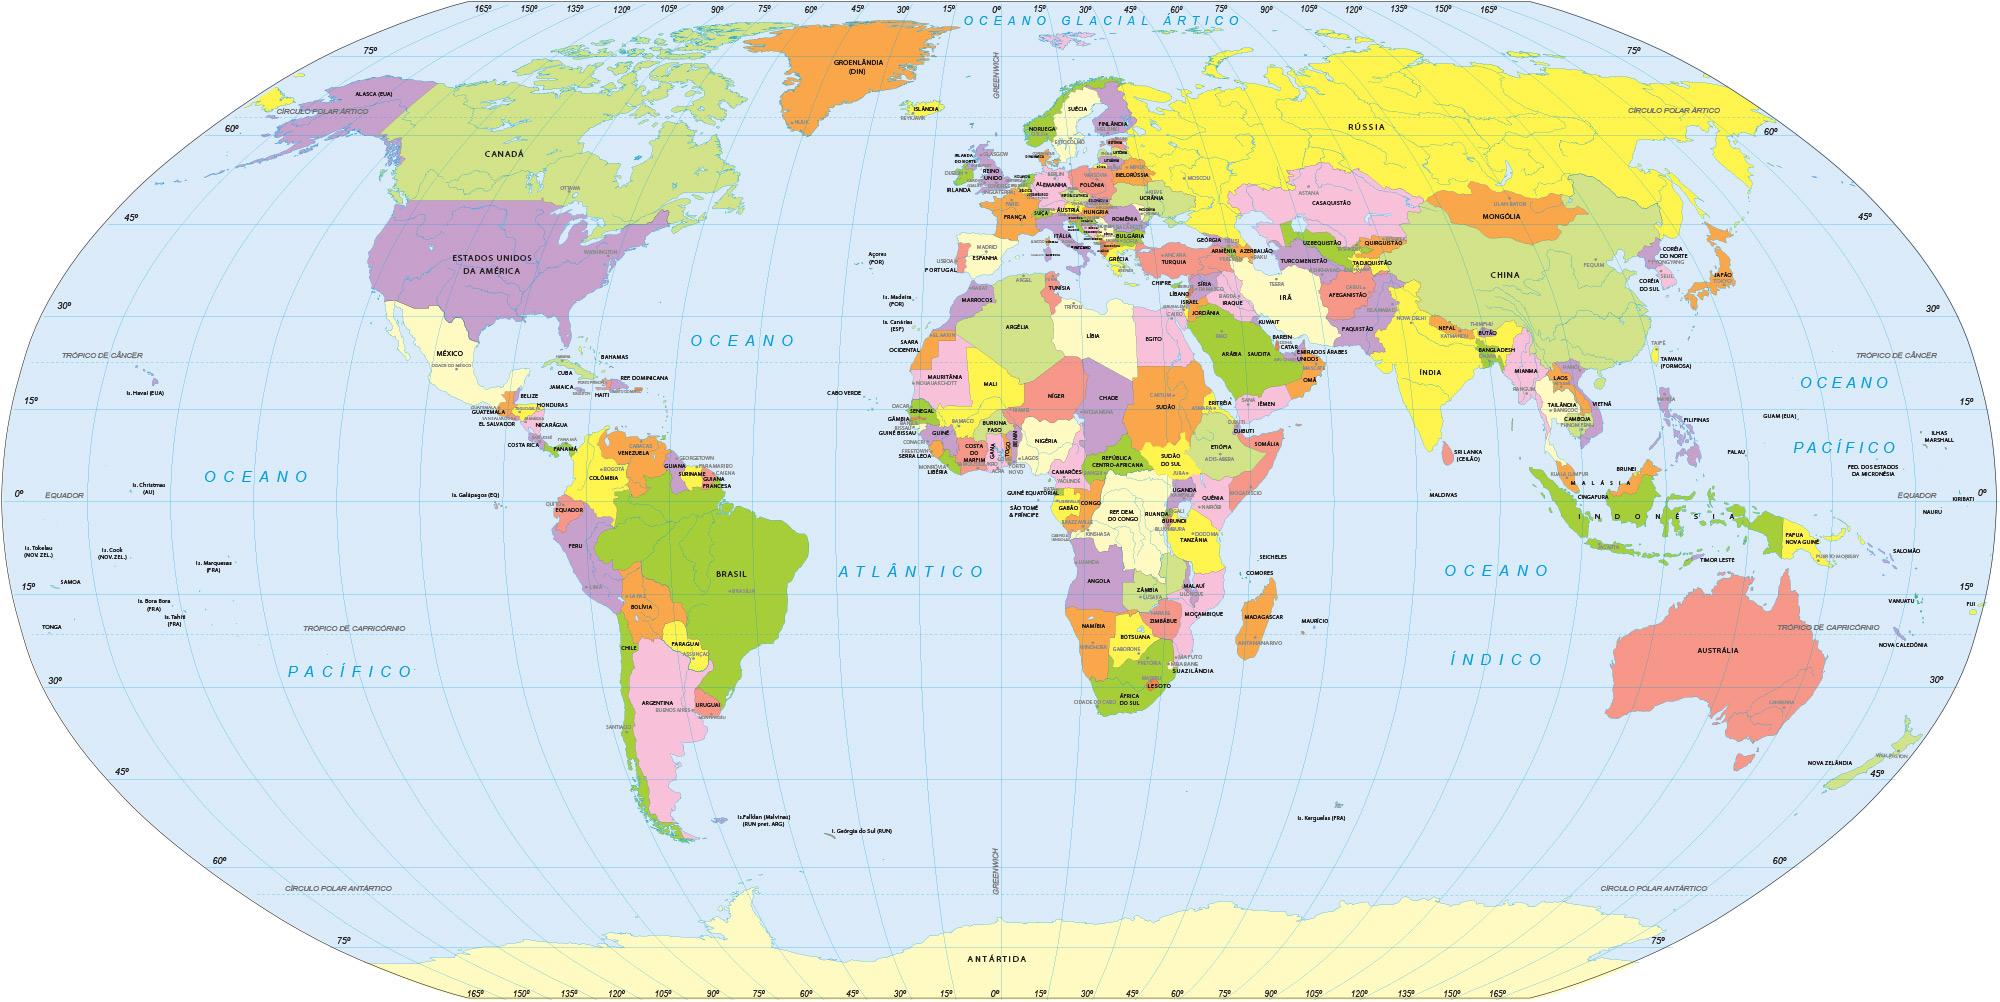 Mapa mundi adesivo grande formato em papel de parede - Papel pintado mapamundi ...